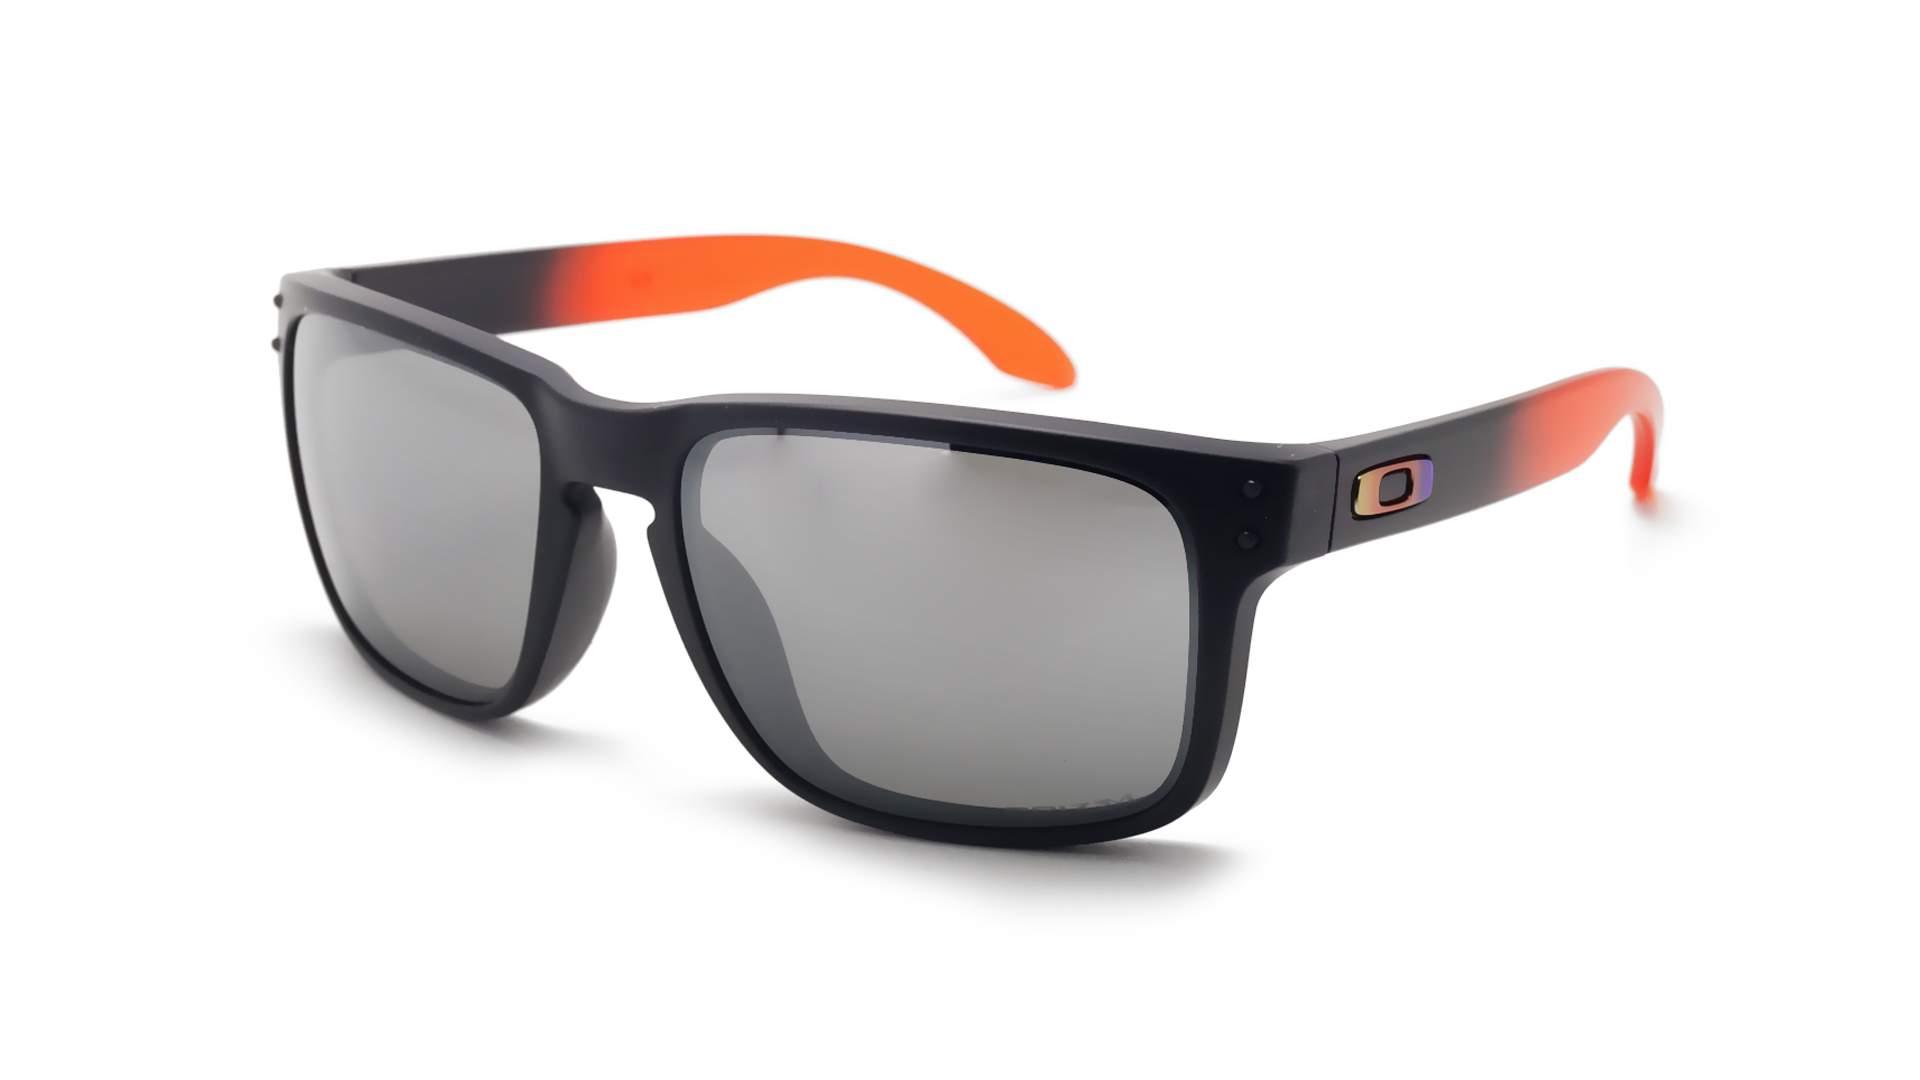 a9919d3f87 Sunglasses Oakley Holbrook Black Matte Prizm OO9102 D3 55-18 Large  Polarized Mirror